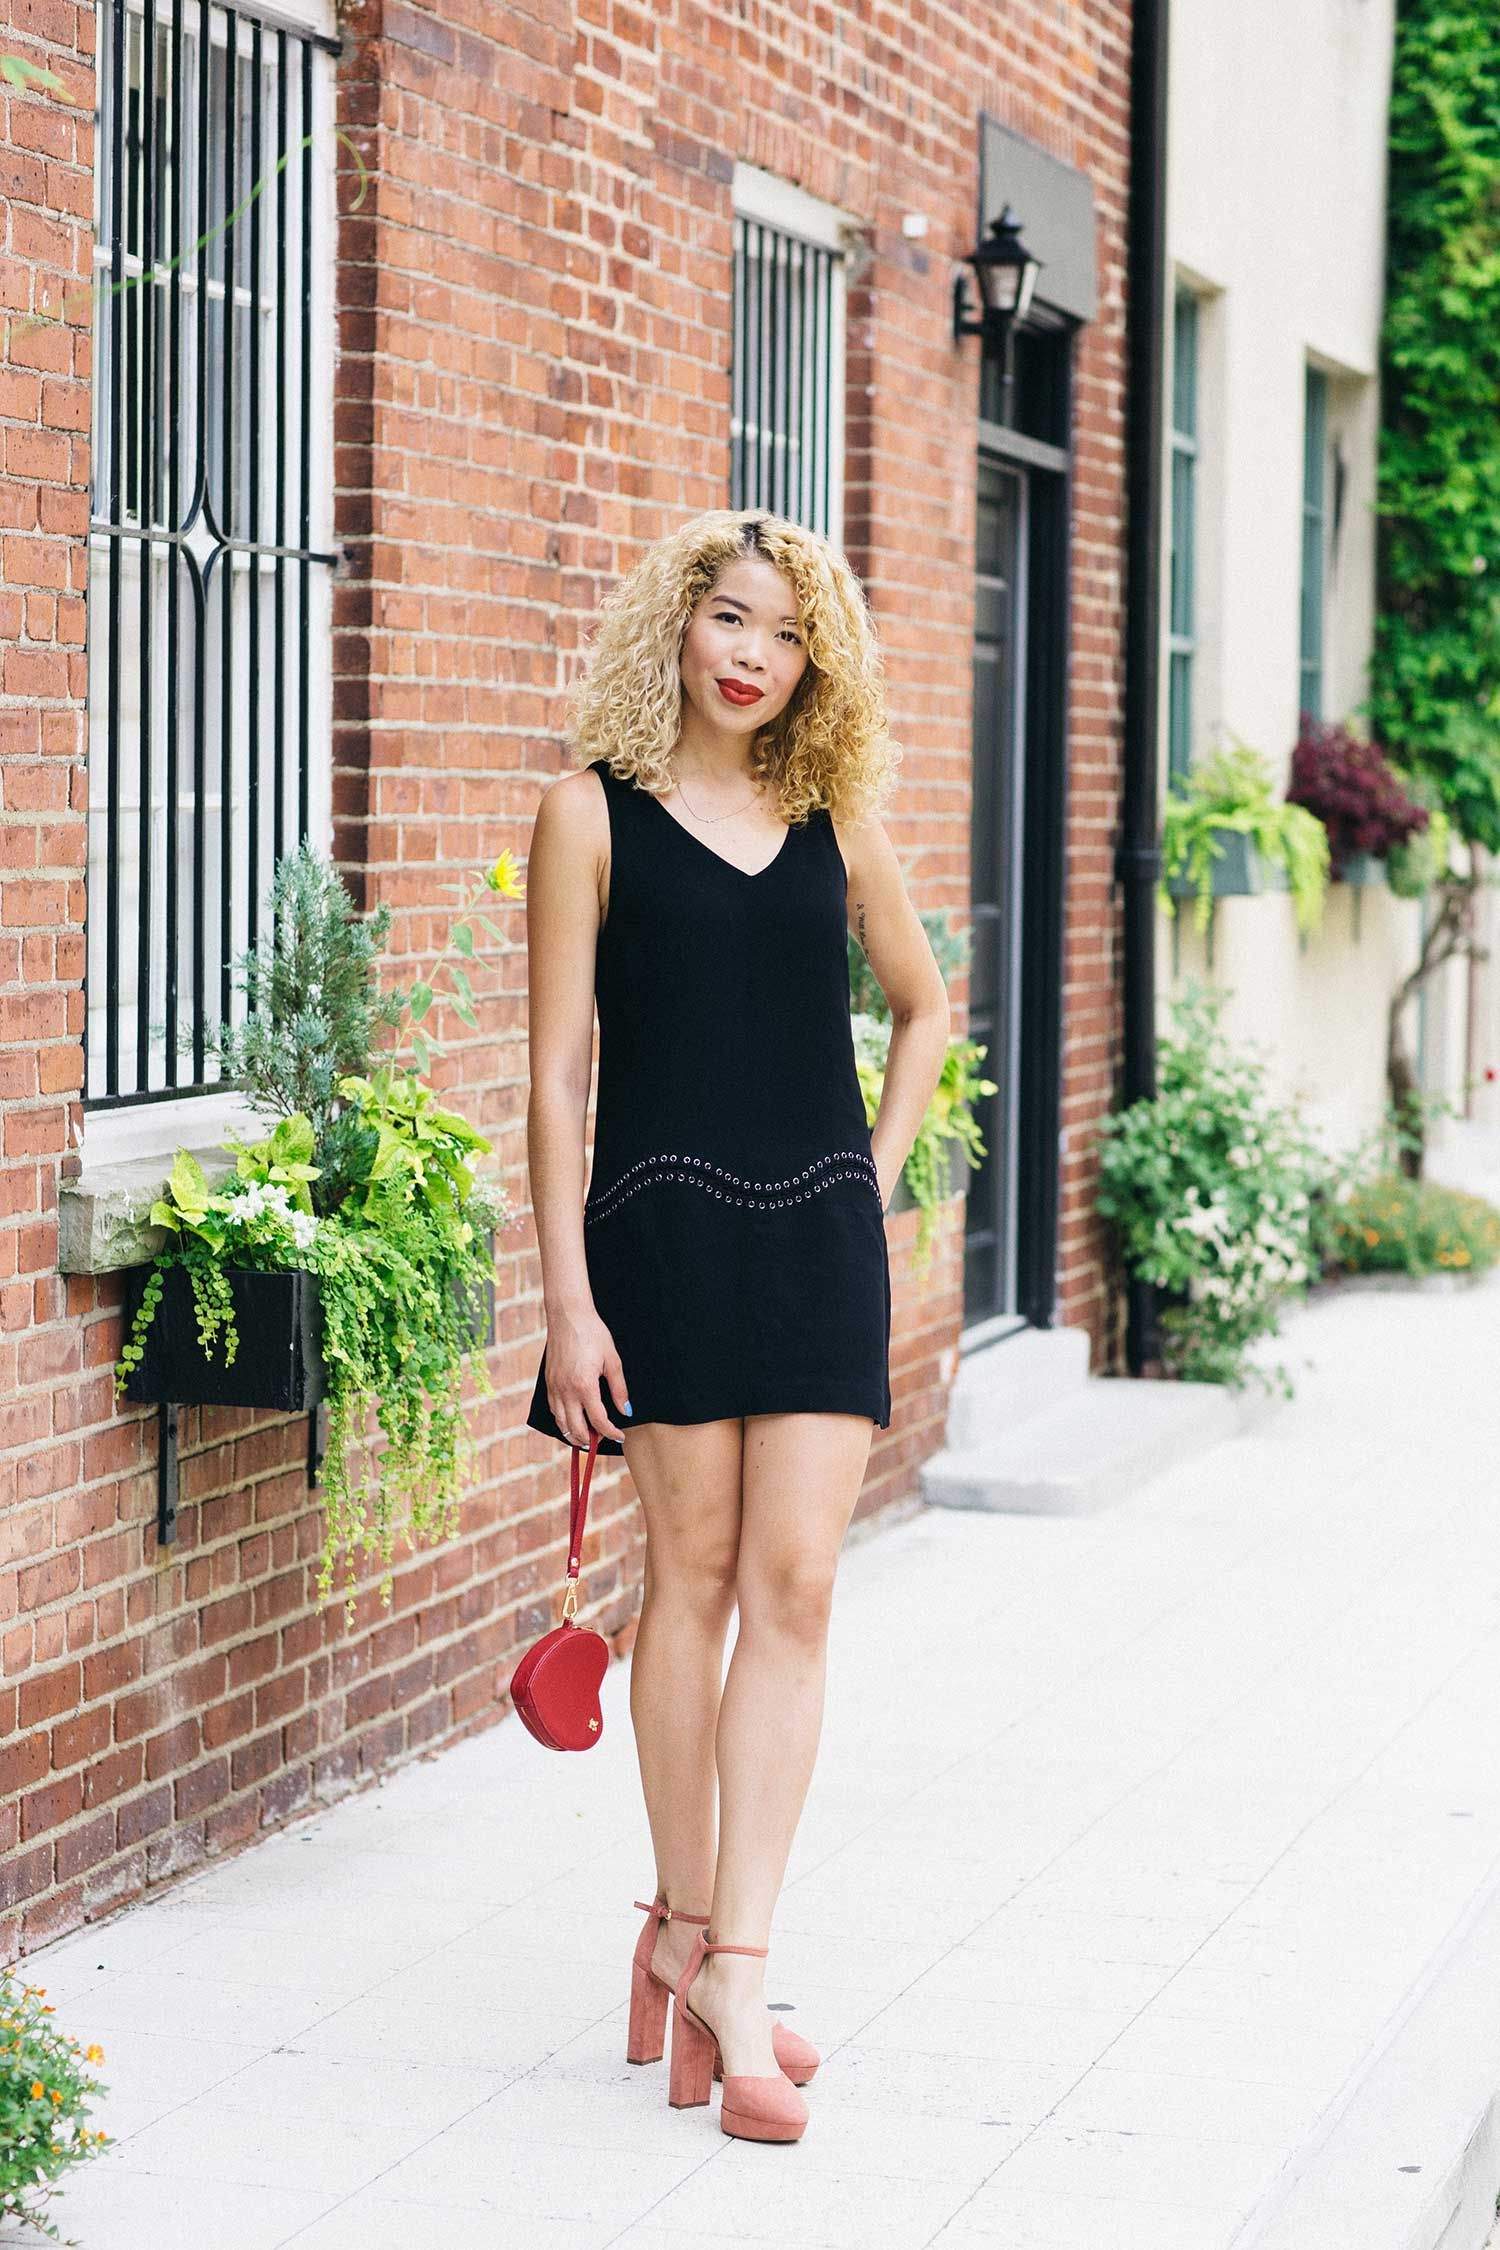 The Little Black Dress W Pink Suede Heels The Style Boro Little Black Dress Pink Suede Heels Dresses [ 2250 x 1500 Pixel ]